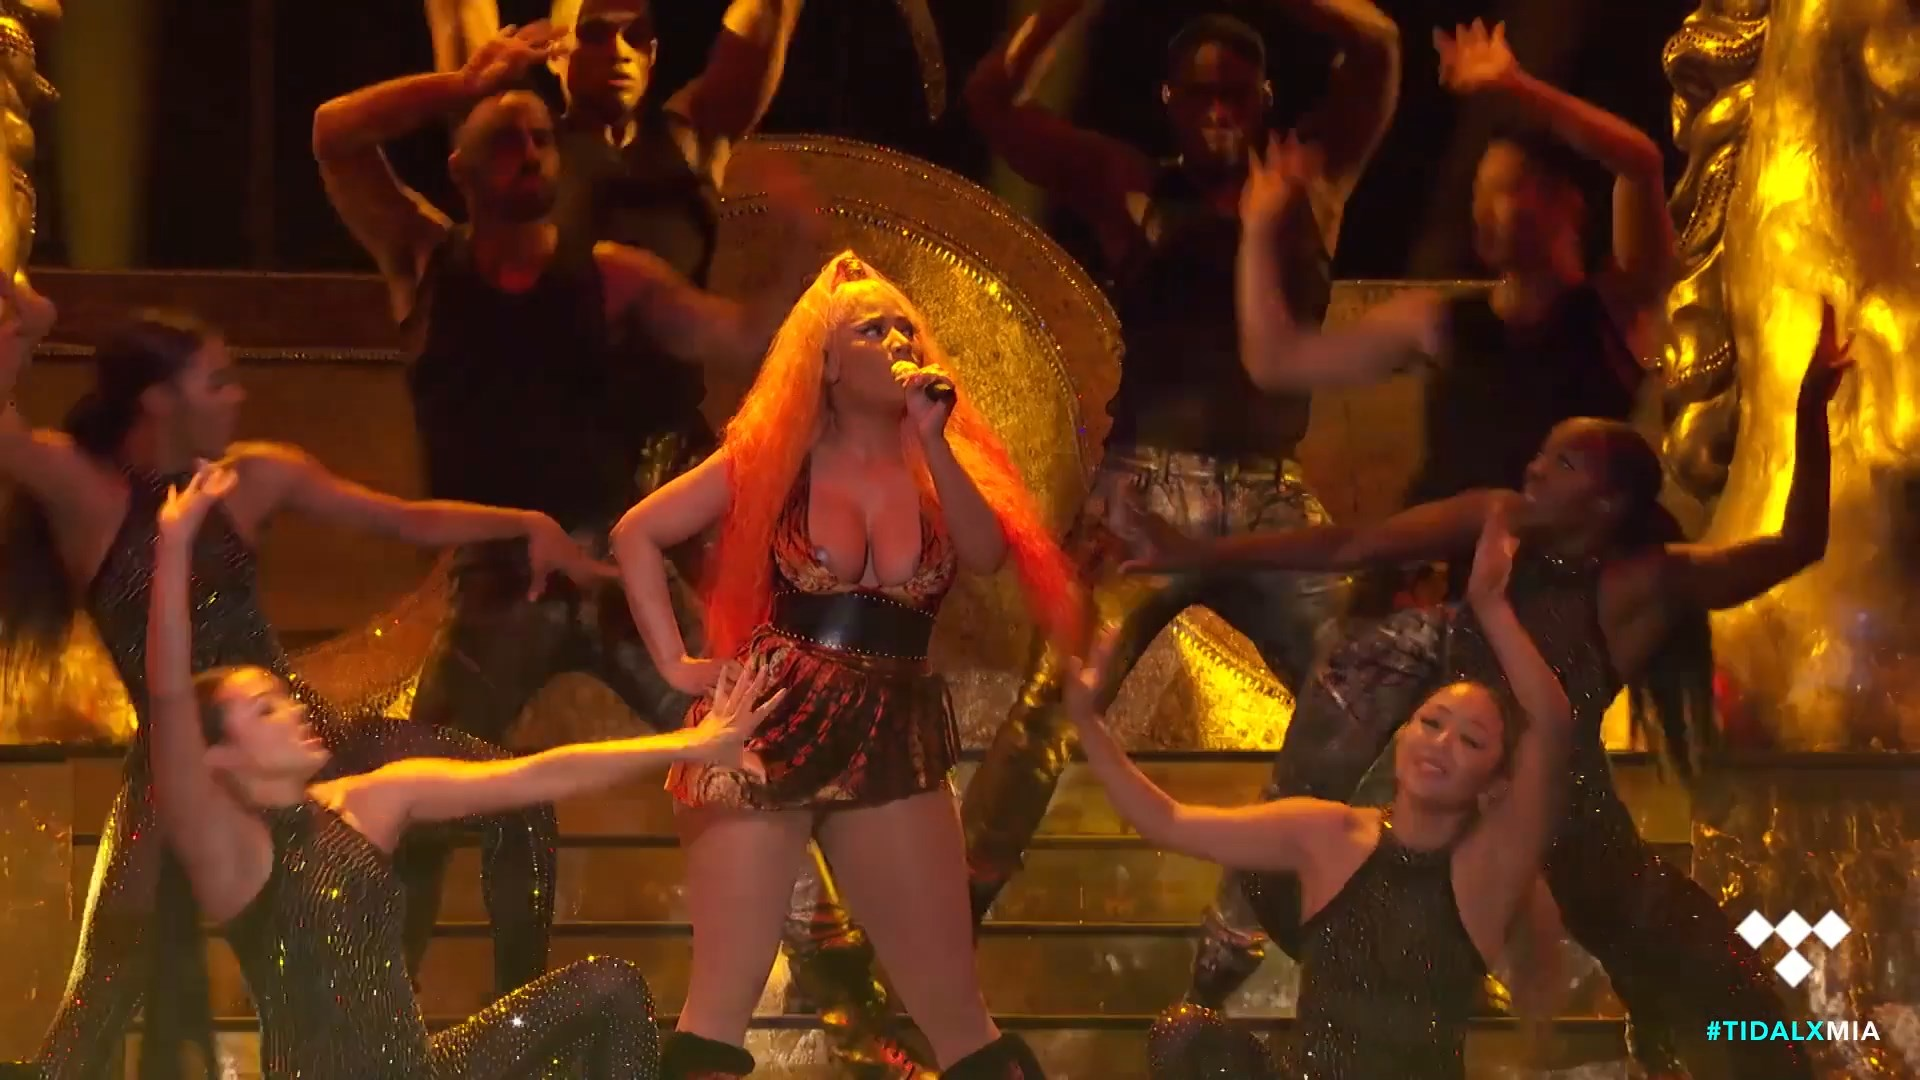 Nicki-Minaj-Nude-TheFappeningBlog.com-7.jpg